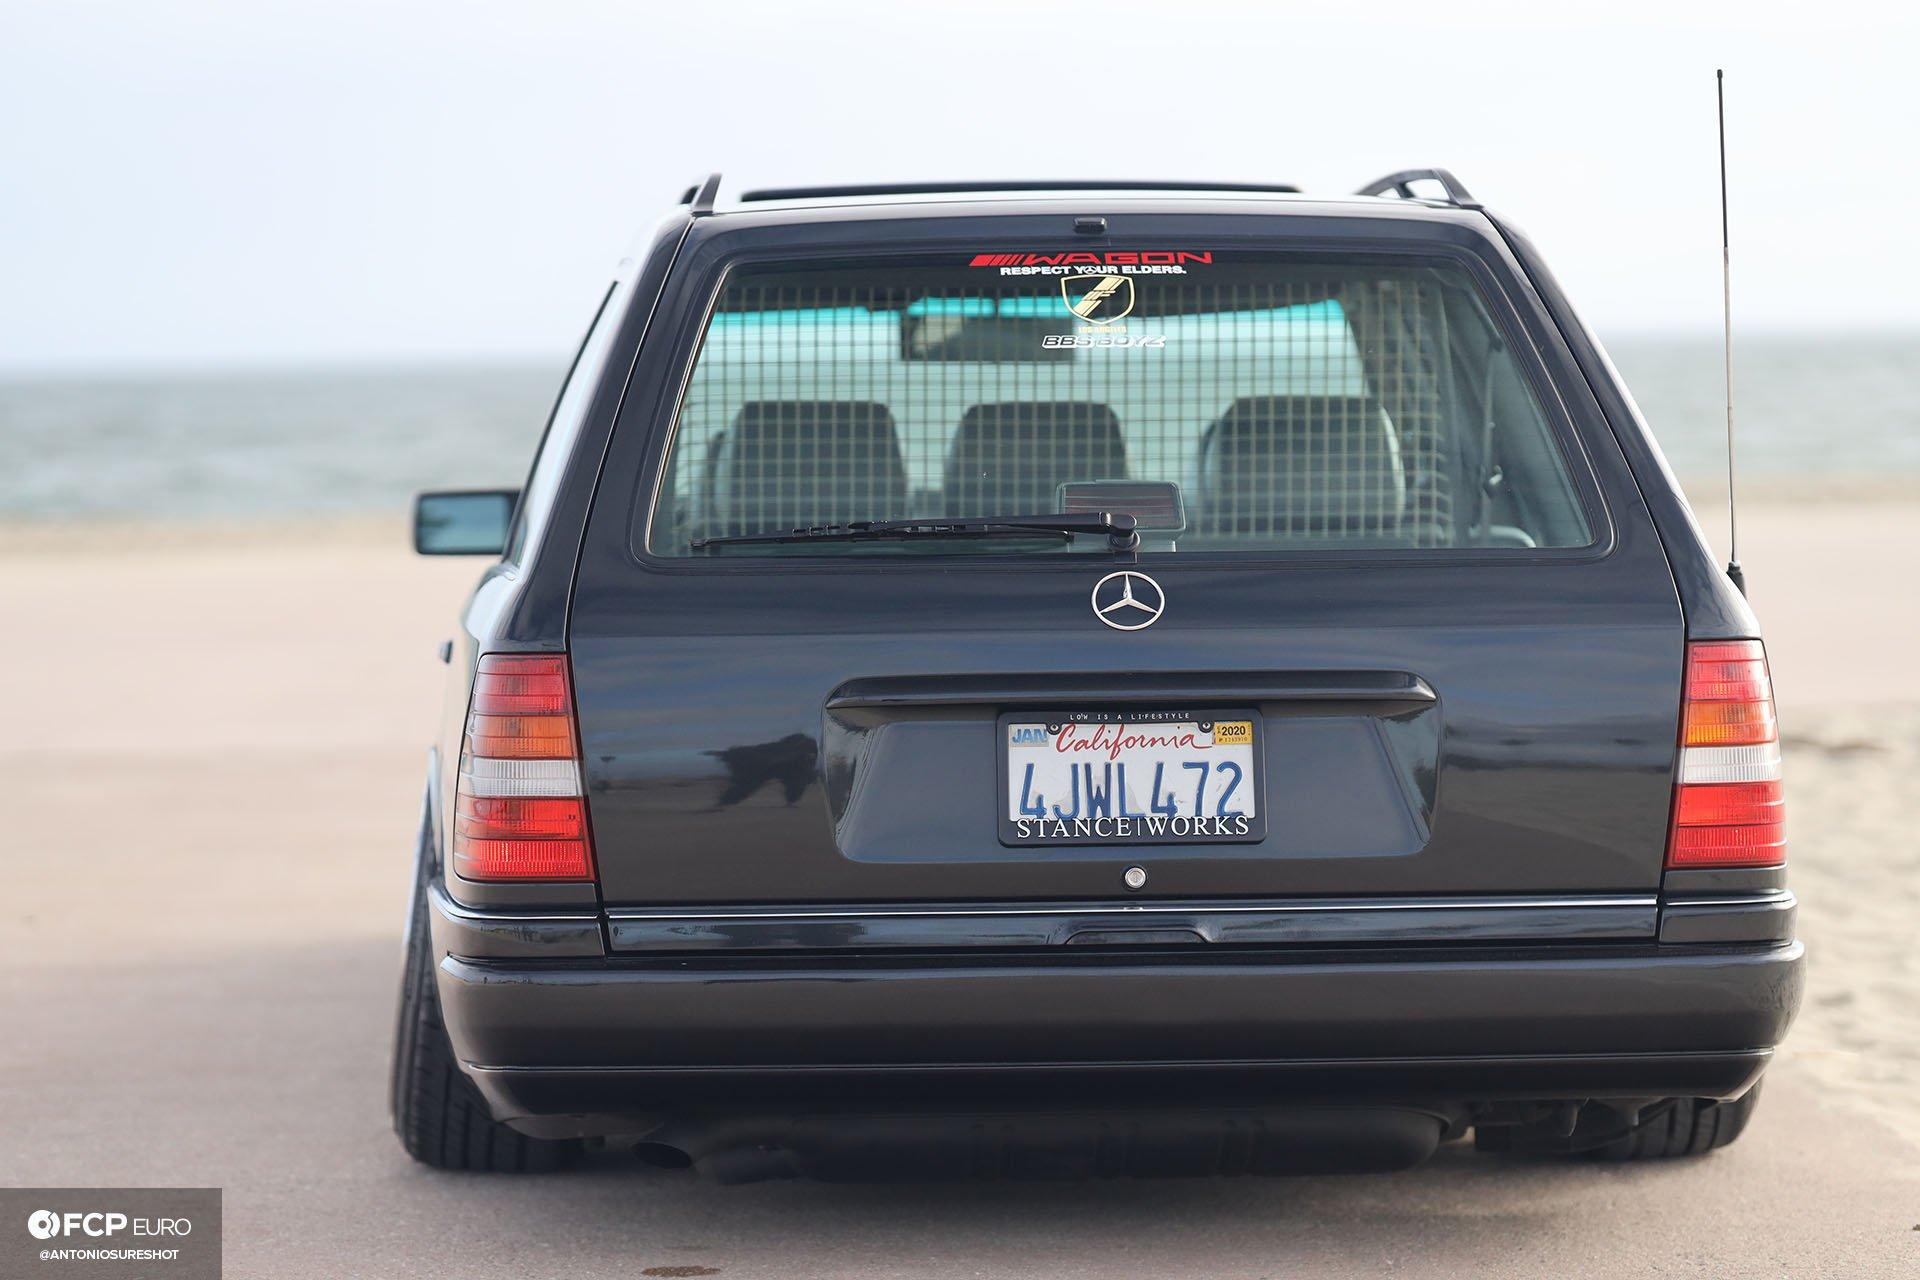 S124 Mercedes Benz E320 wagon 199 Black Pearl Metallic